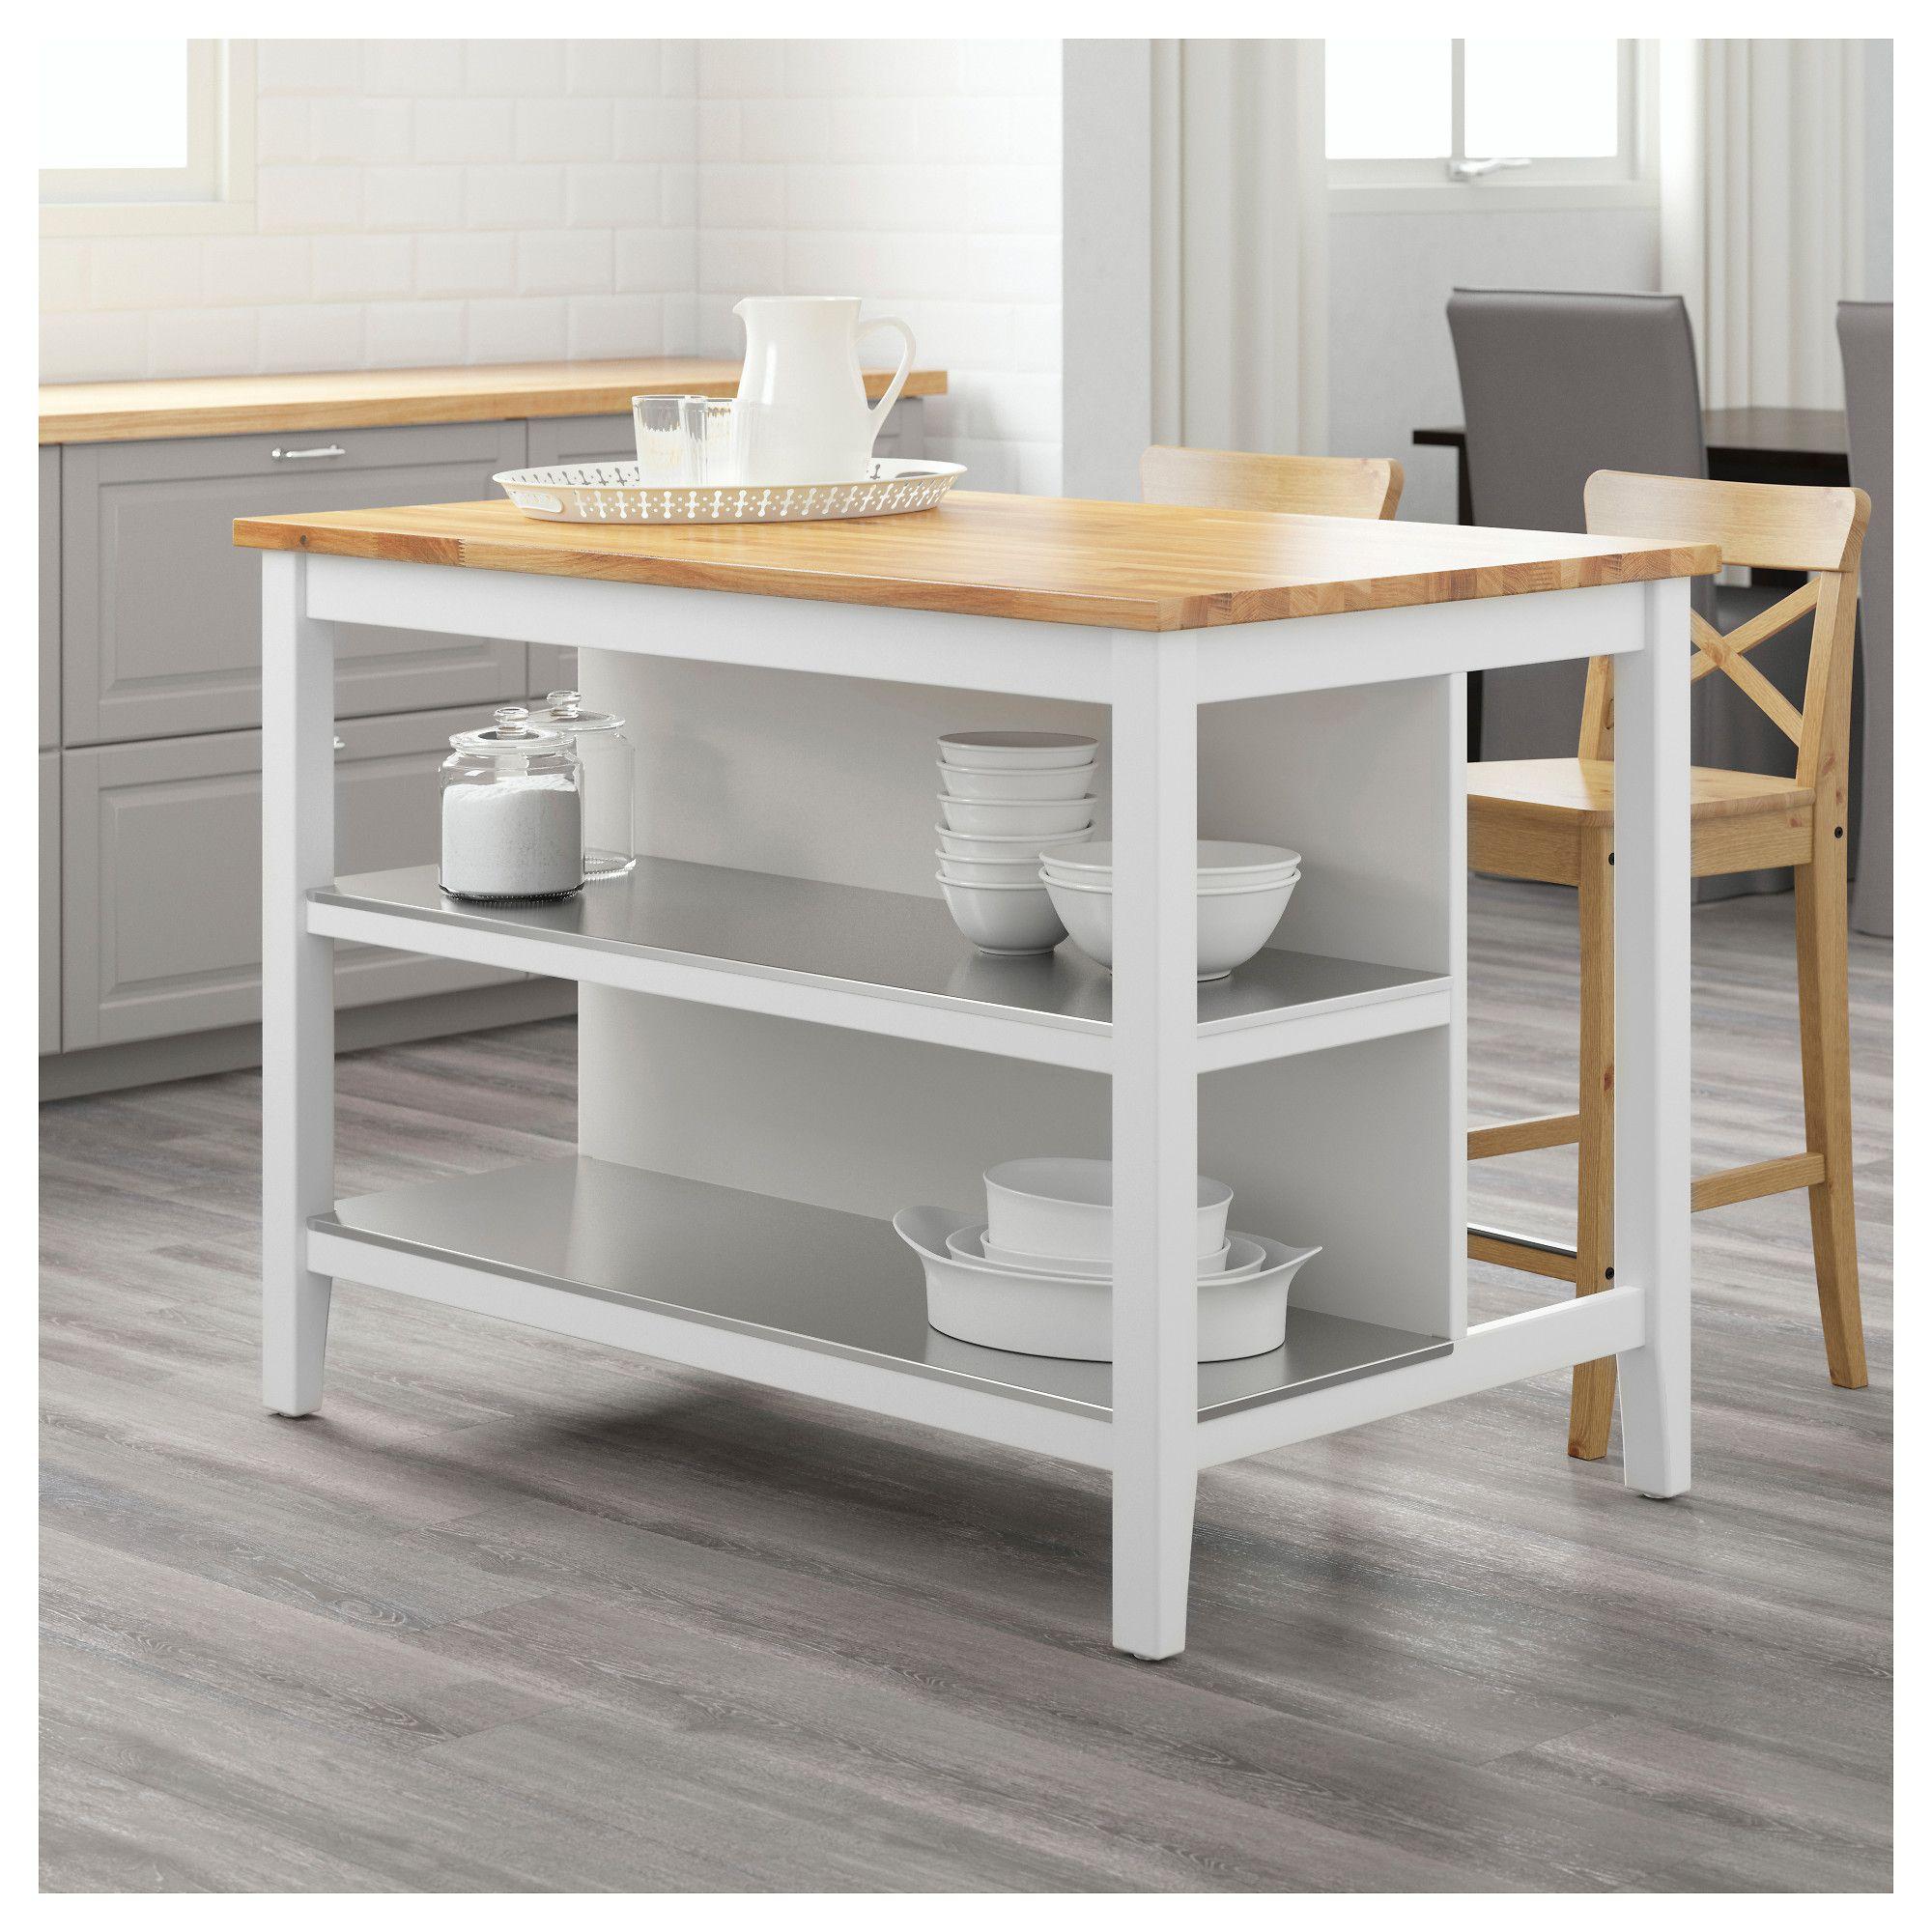 STENSTORP Kitchen island White/oak 126x79 cm